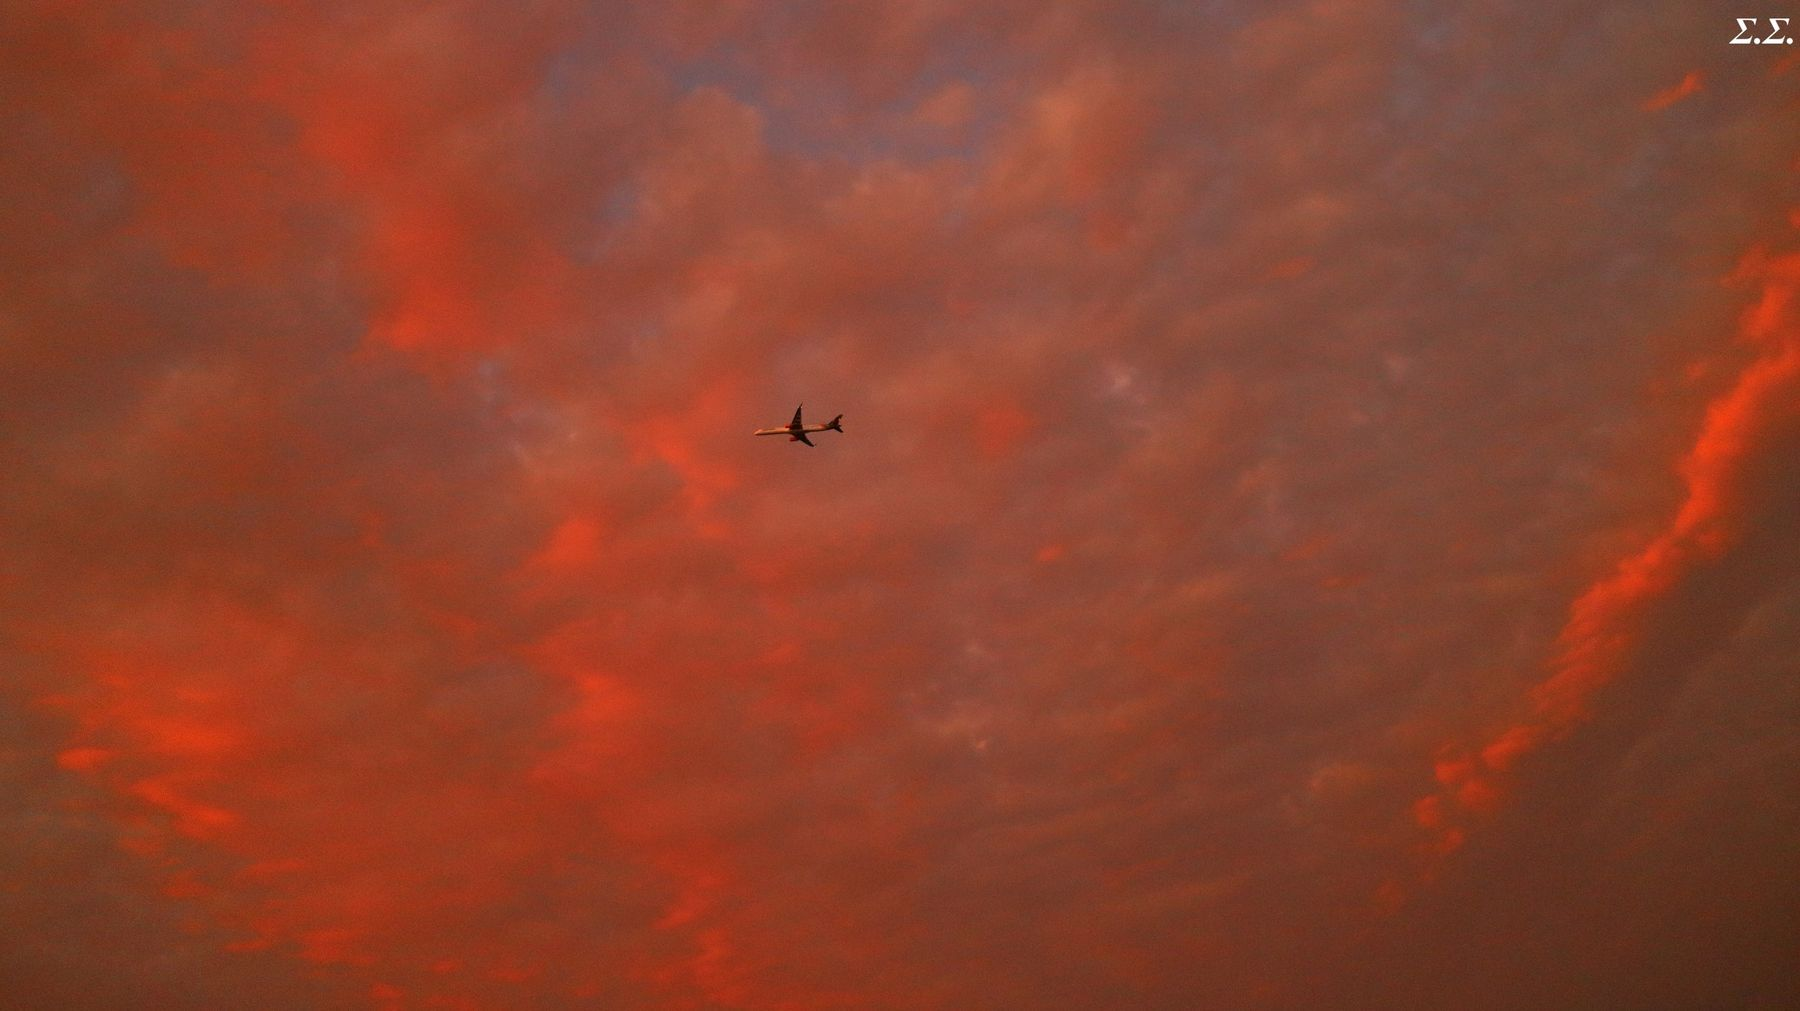 FLYING THROUGH THE SKYFIRE